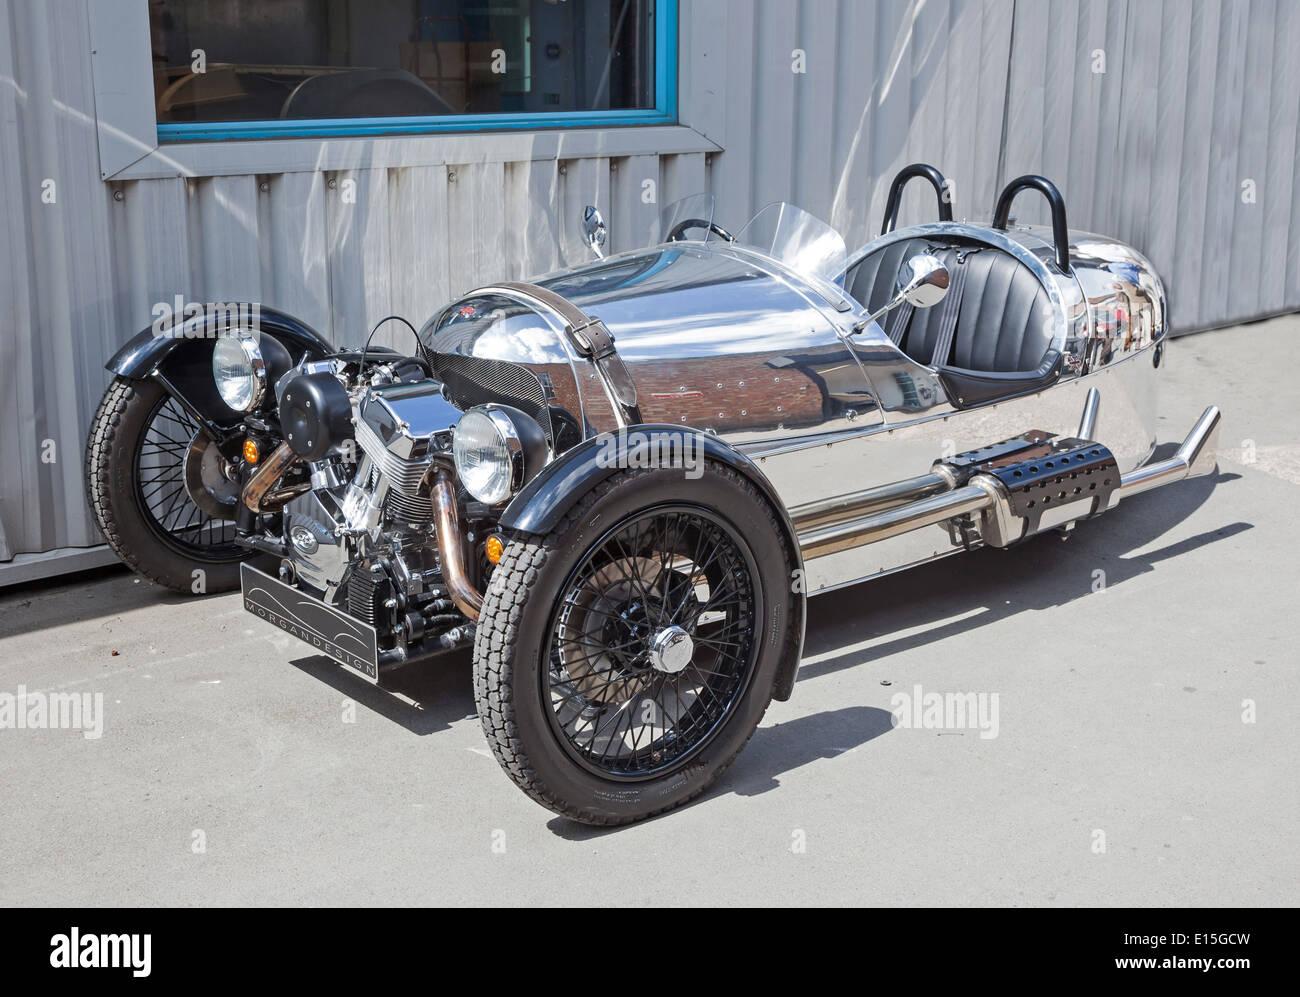 Morgan Motors Car factory Stock Photo: 69578793 - Alamy